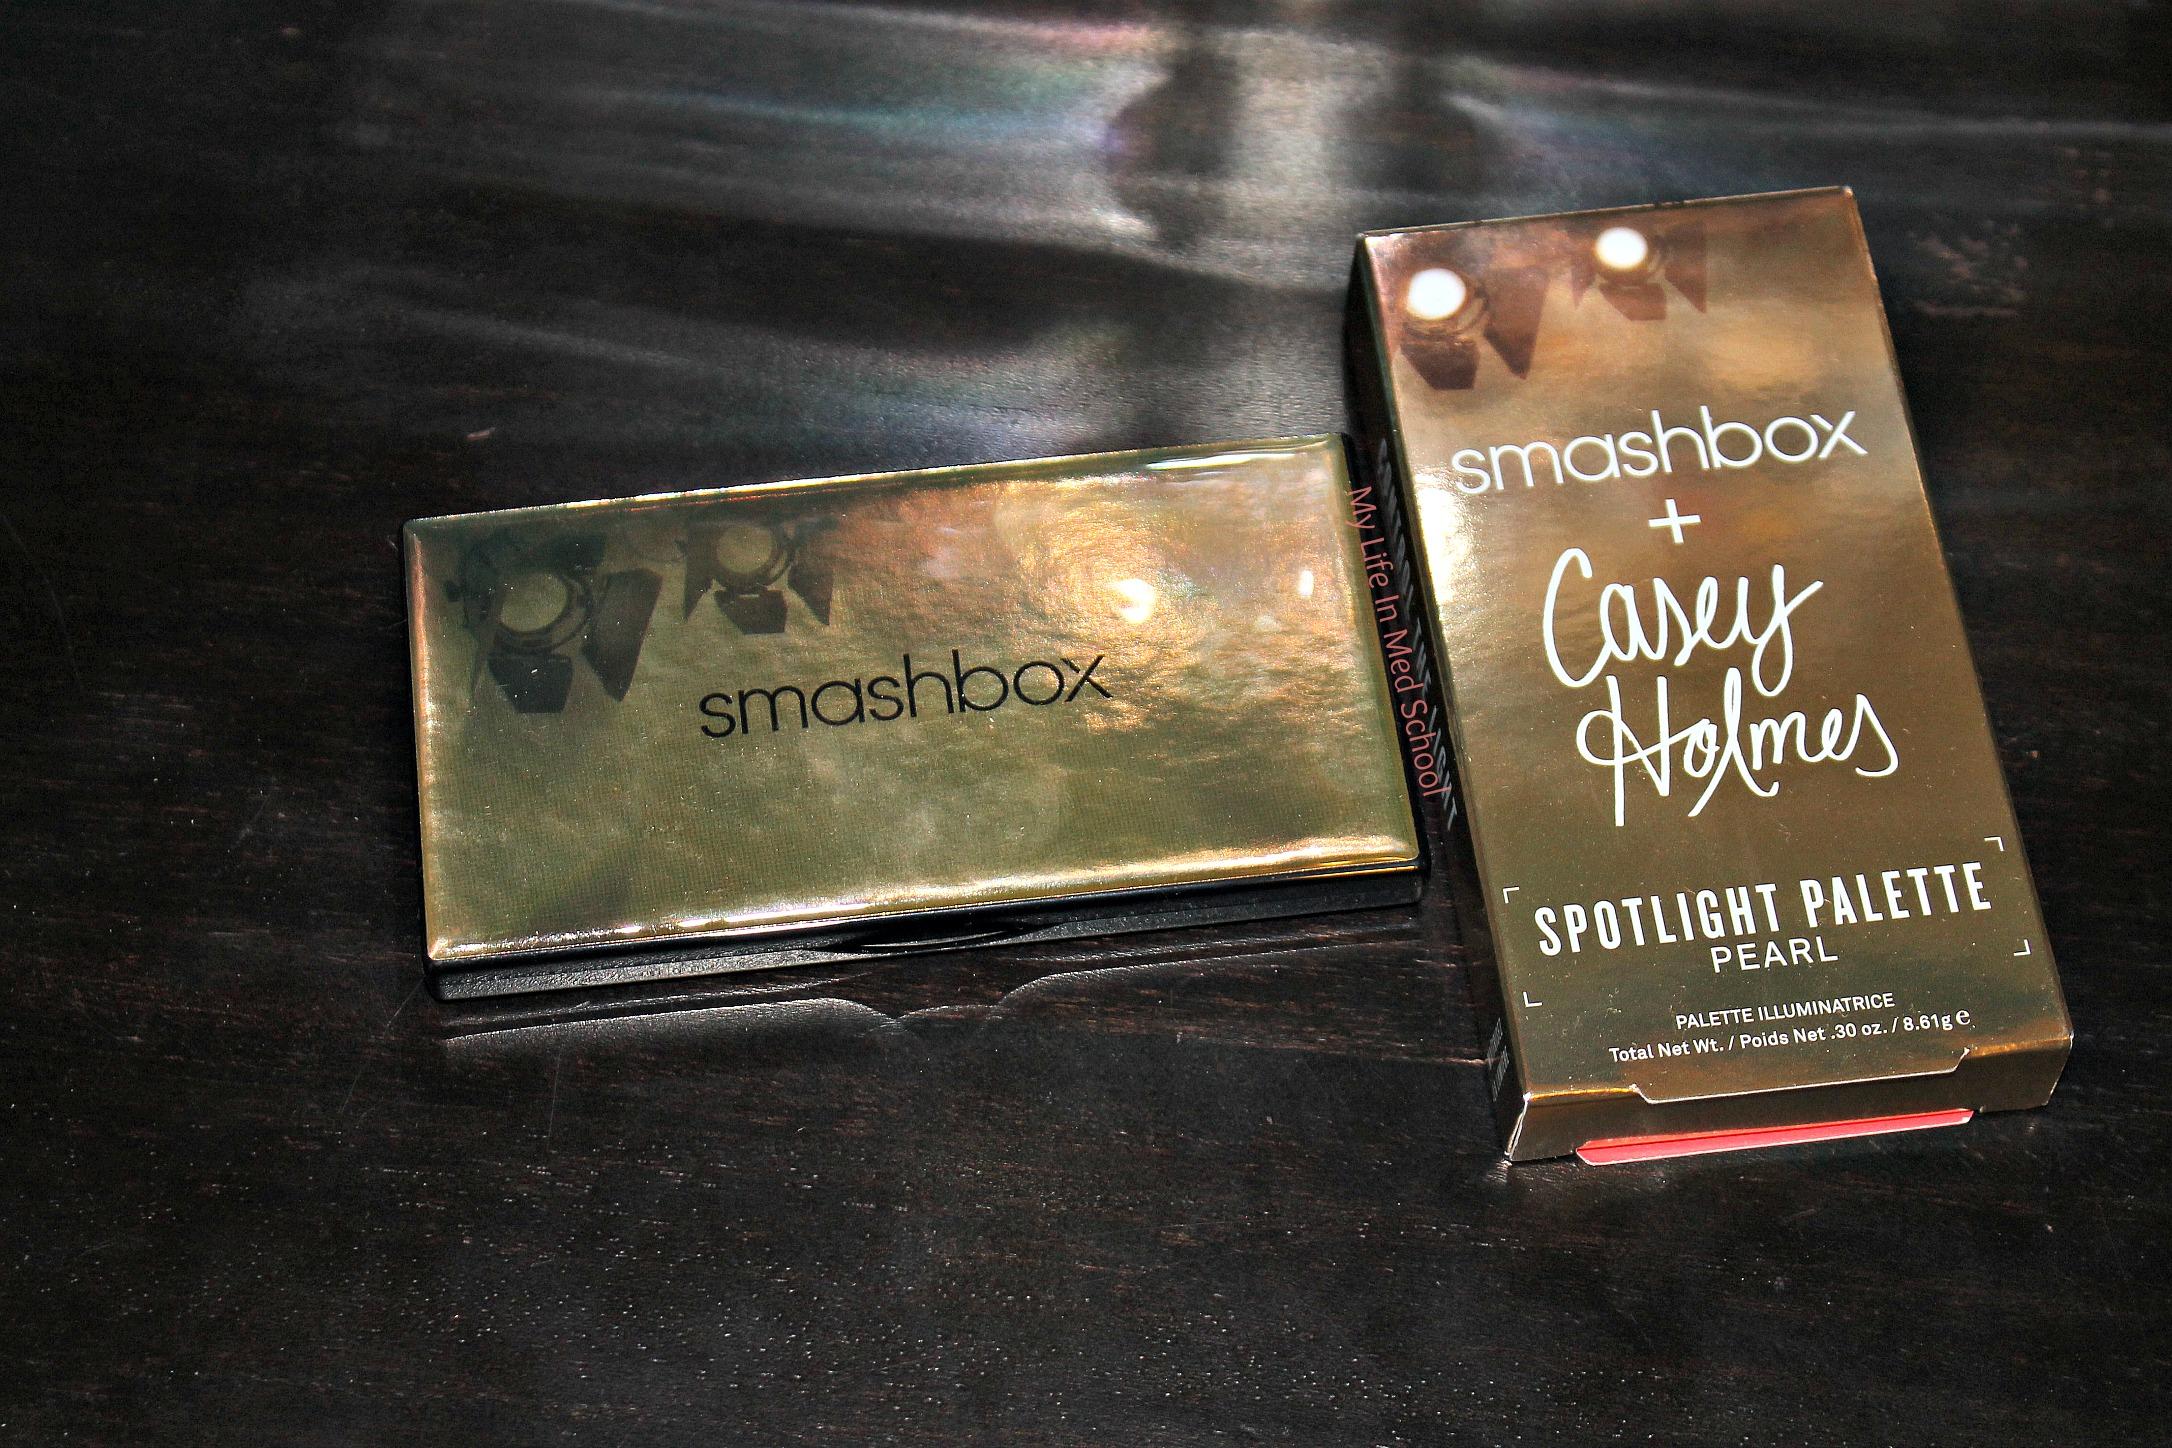 Casey Holmes x Smashbox Spotlight Palette Pearl